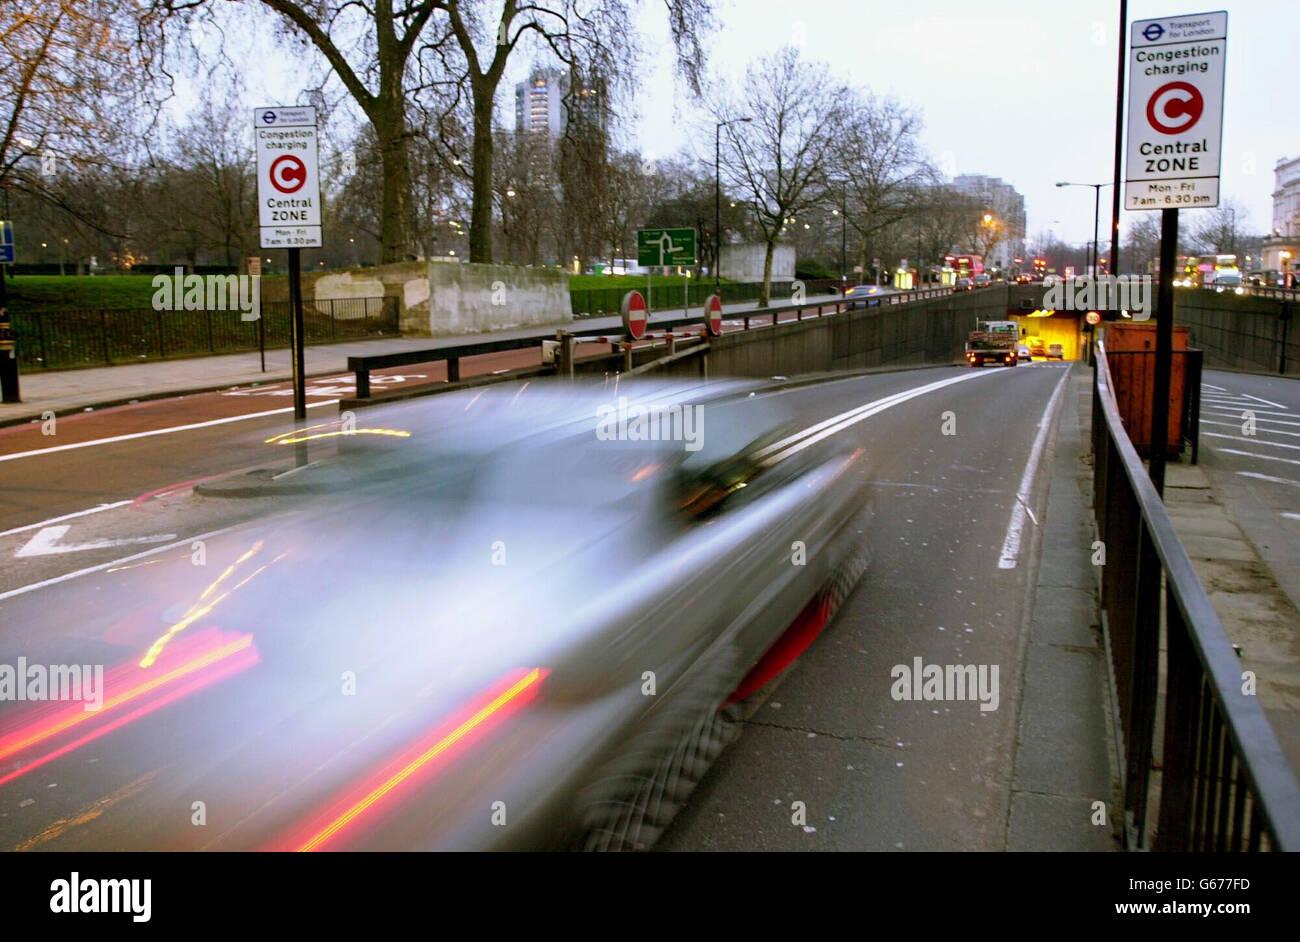 Congestion Charging begins - Stock Image